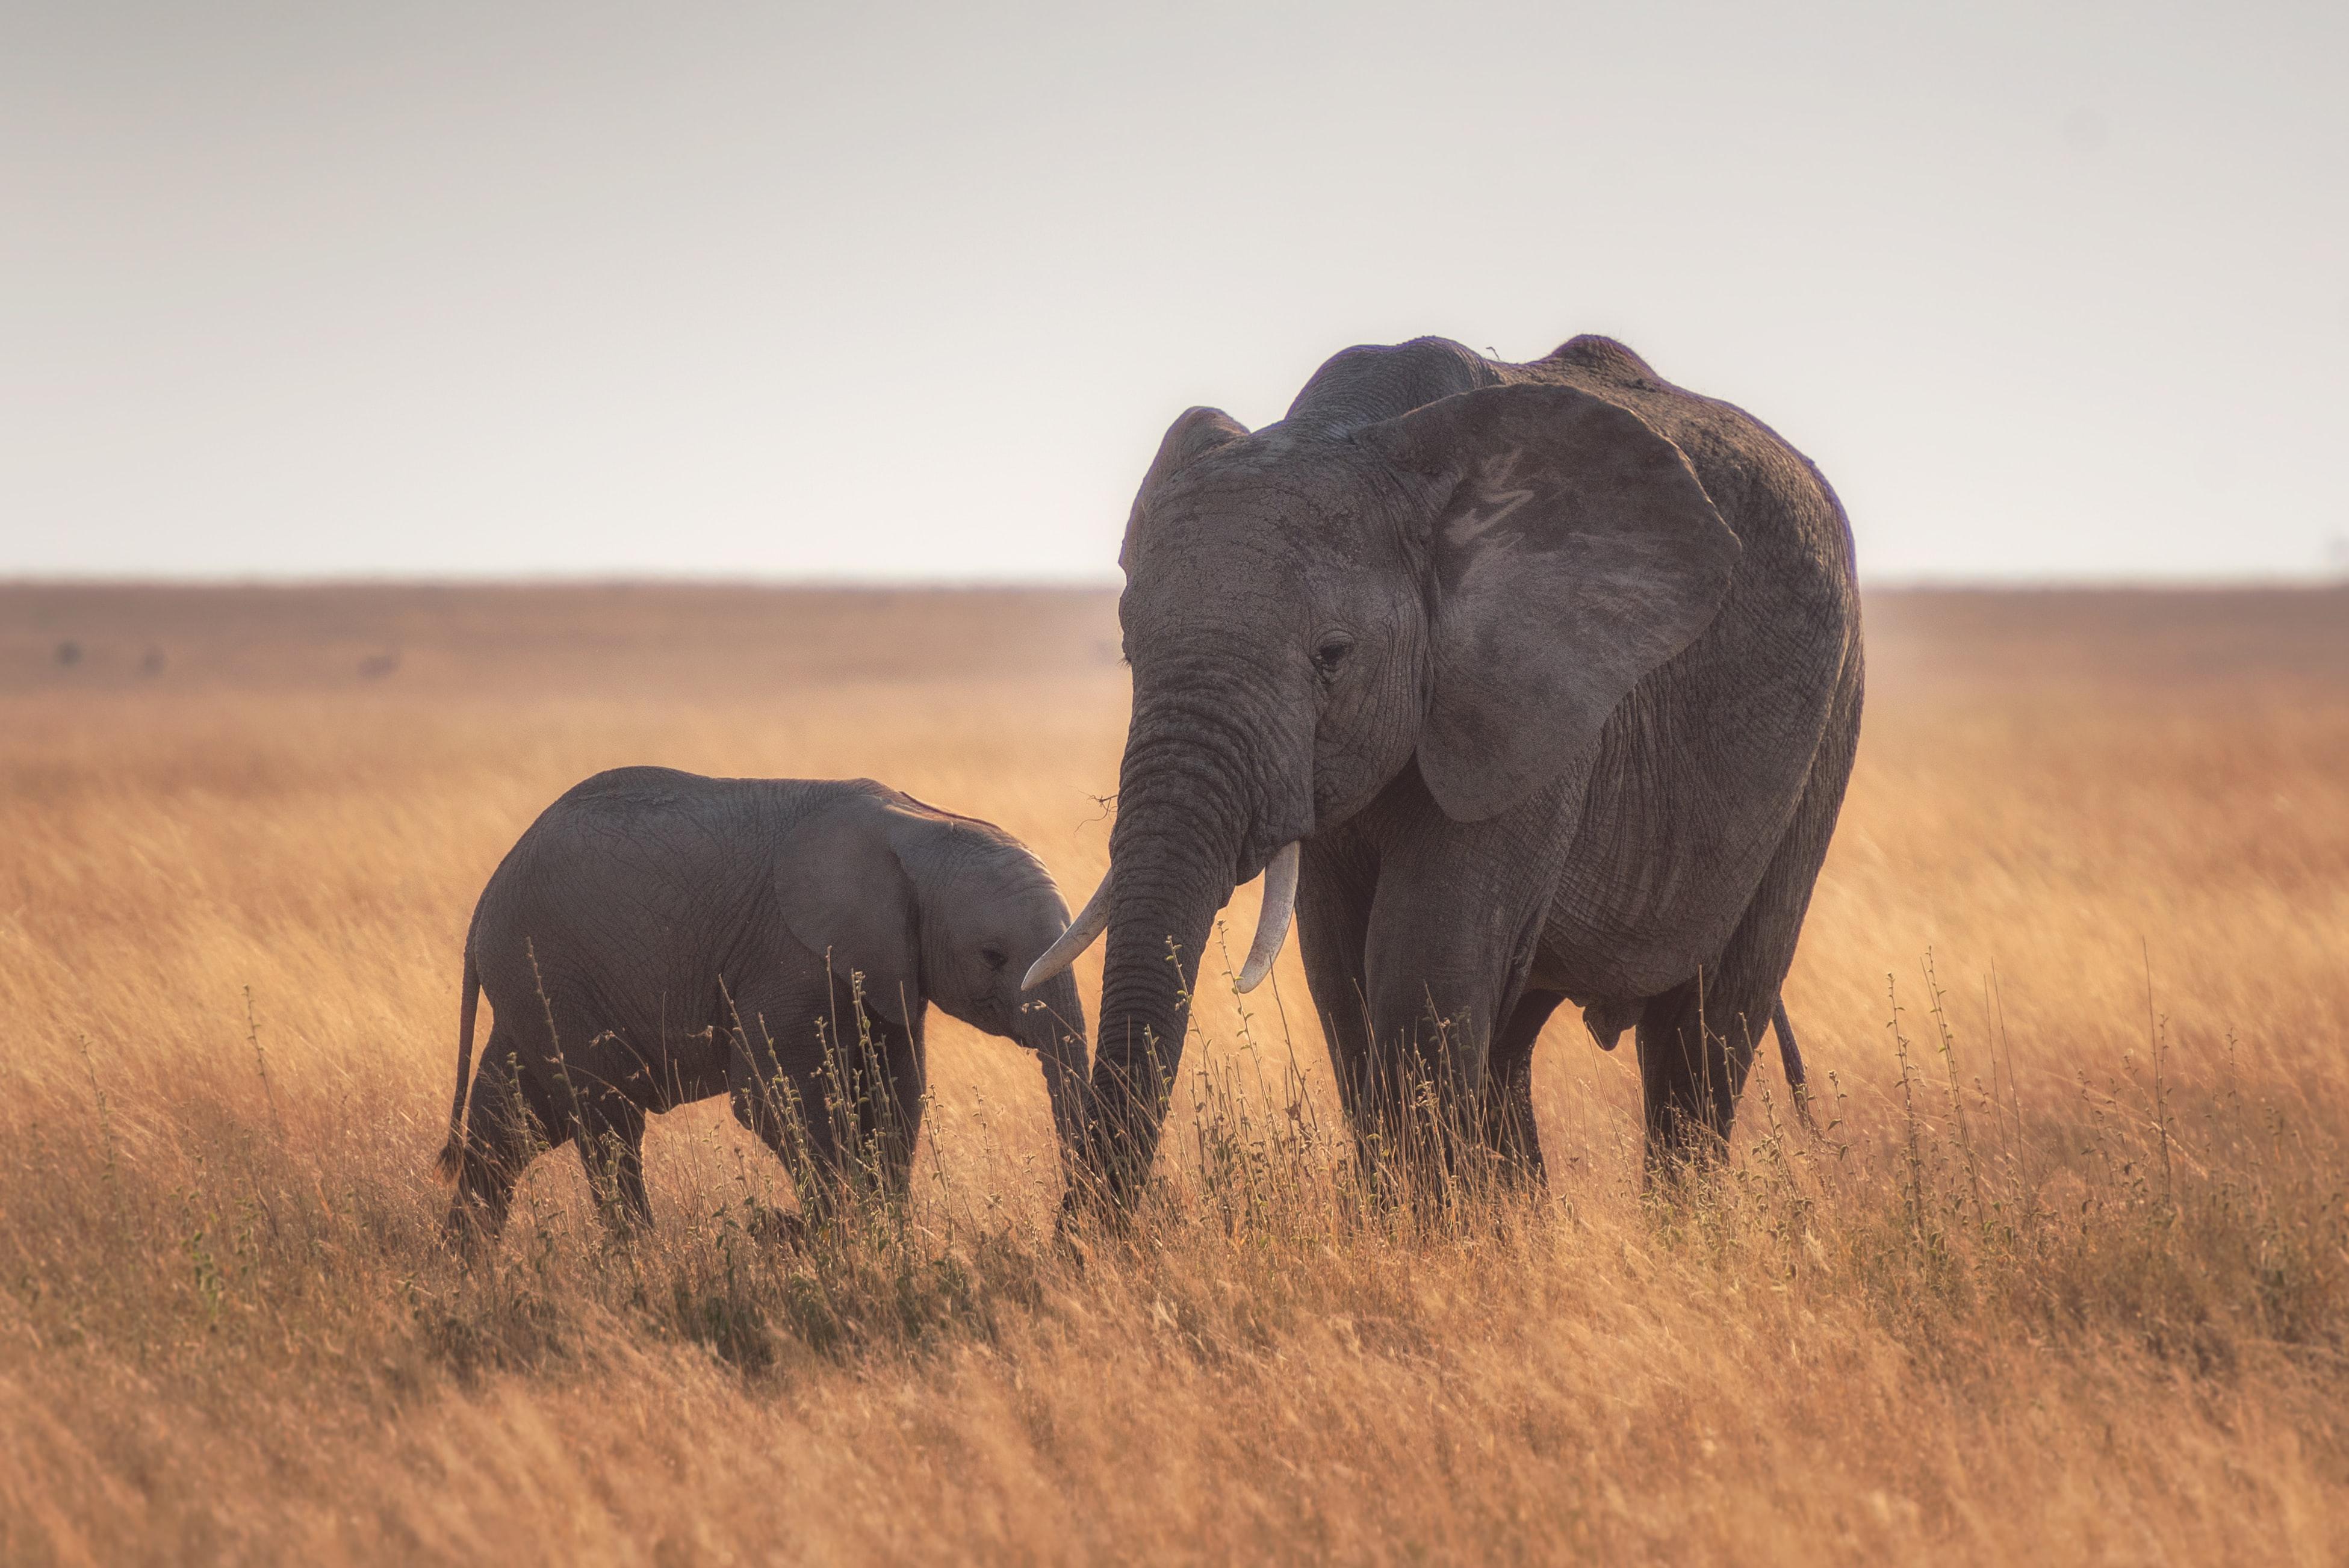 1366x768 Mother Baby Elephant 4k 1366x768 Resolution HD 4k ...